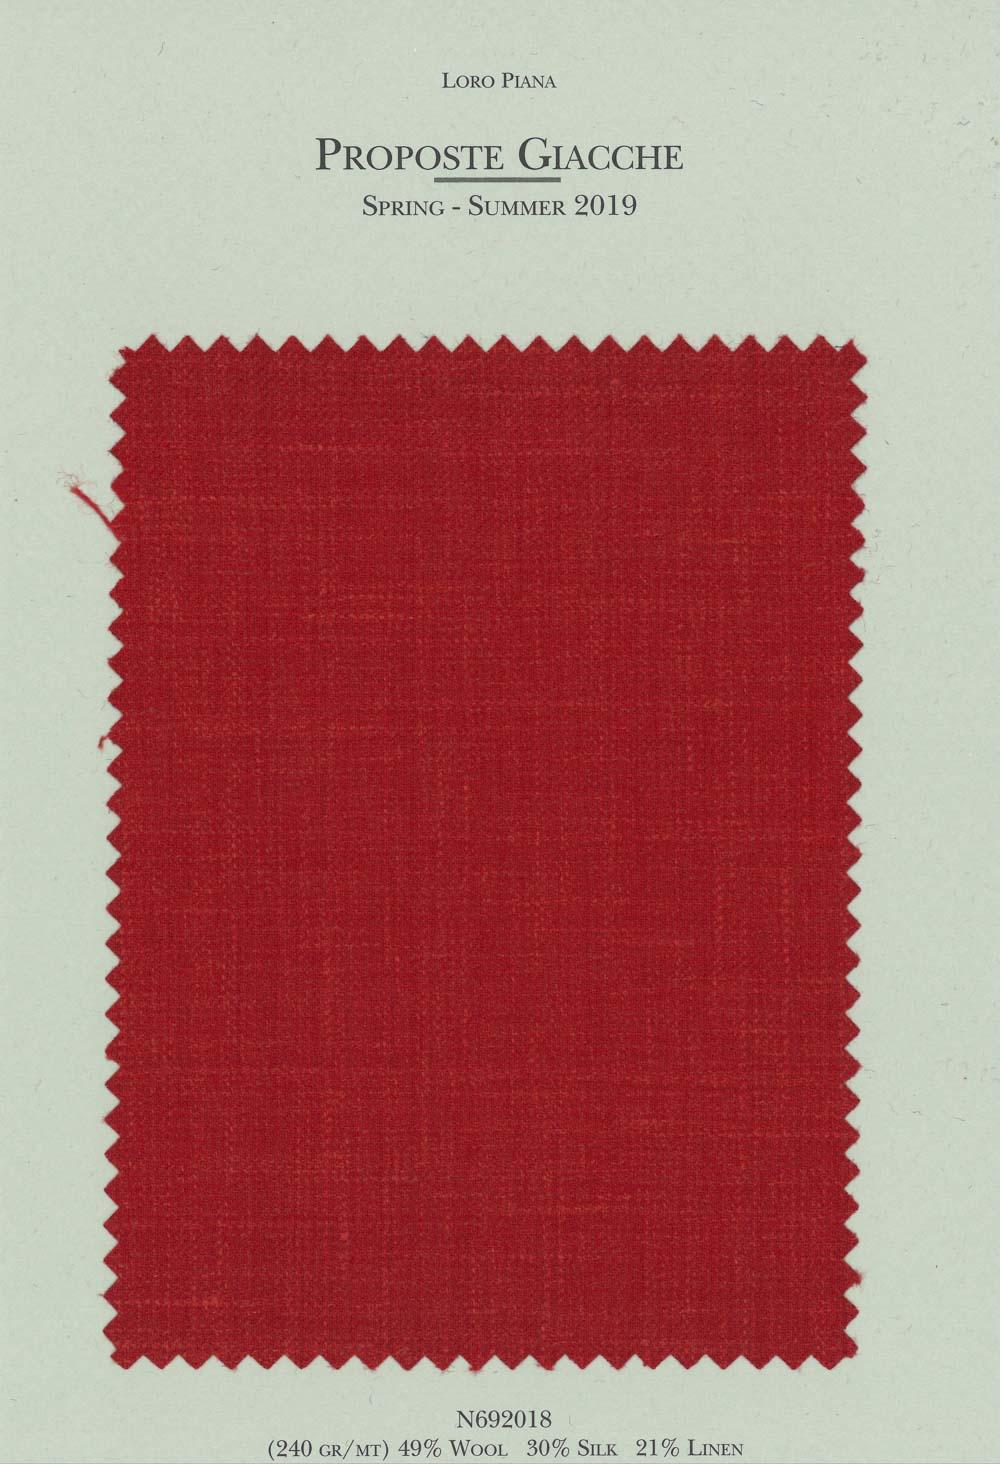 N692018